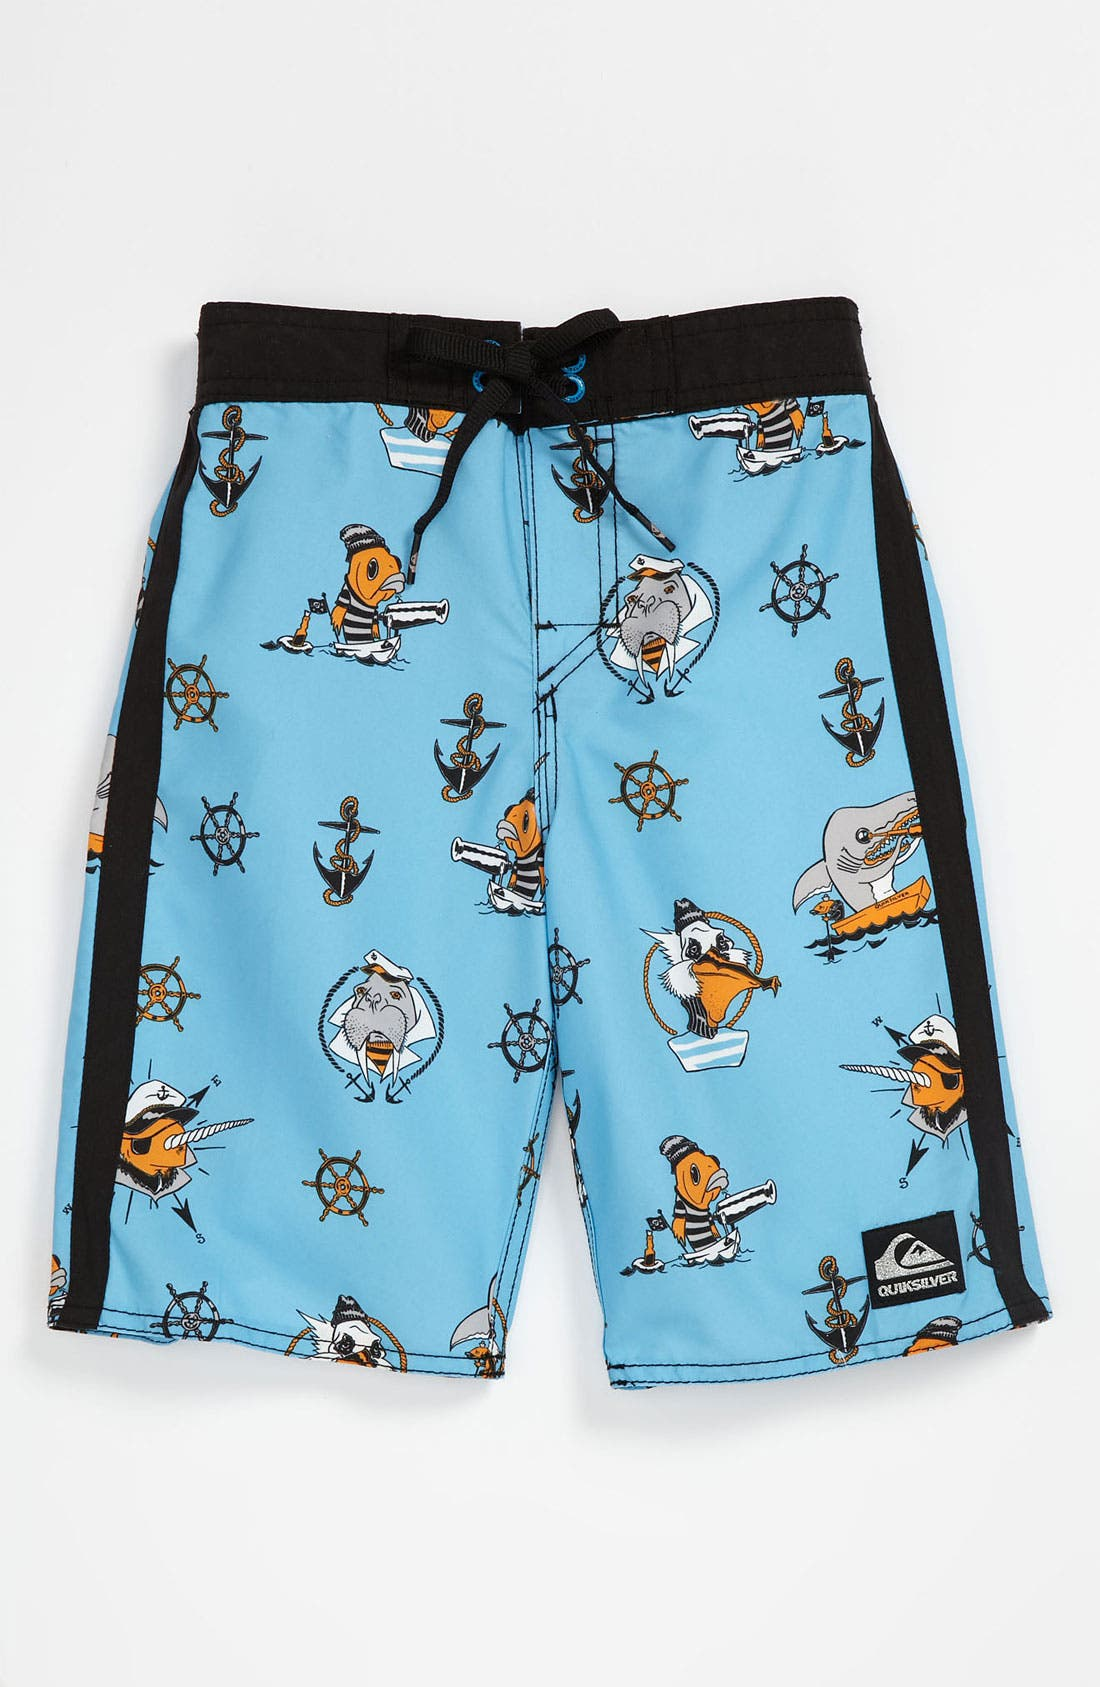 Alternate Image 1 Selected - Quiksilver 'Briny Deep' Board Shorts (Little Boys)